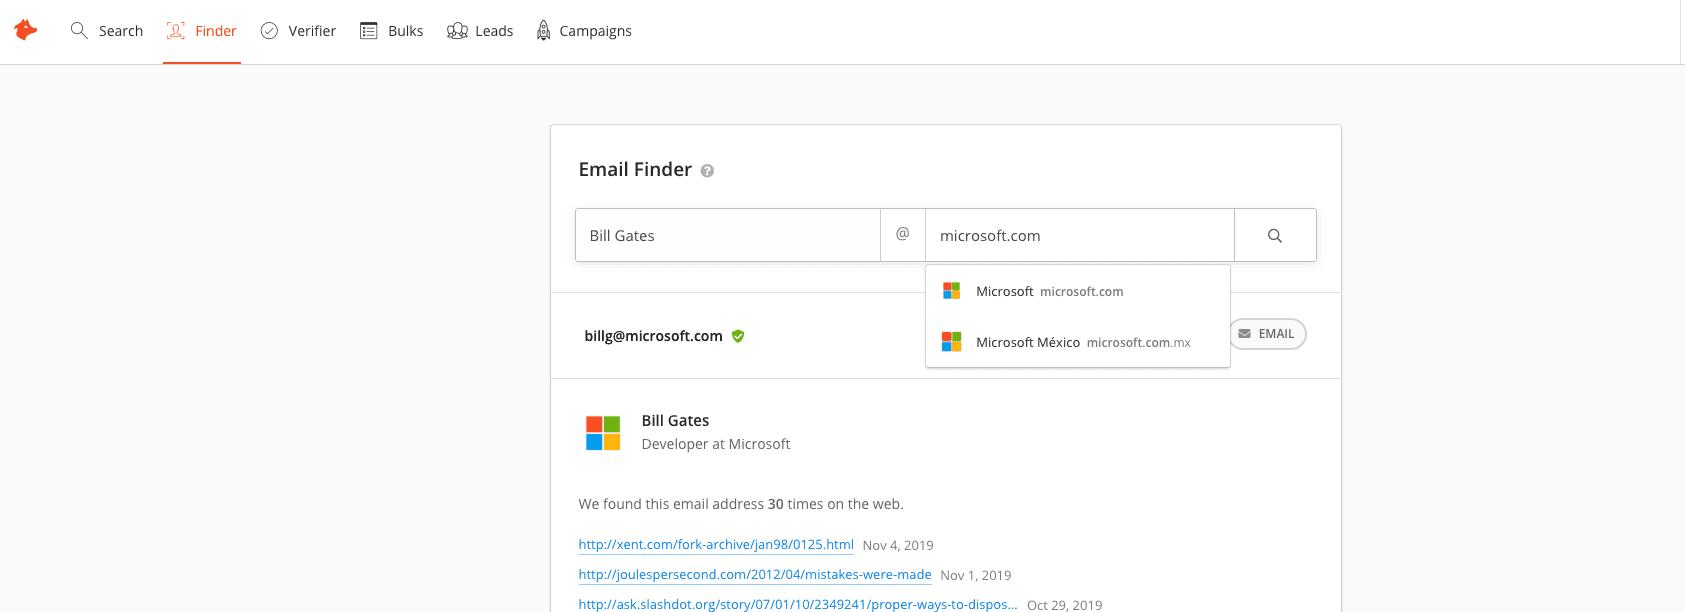 Bill Gates Microsoft Email